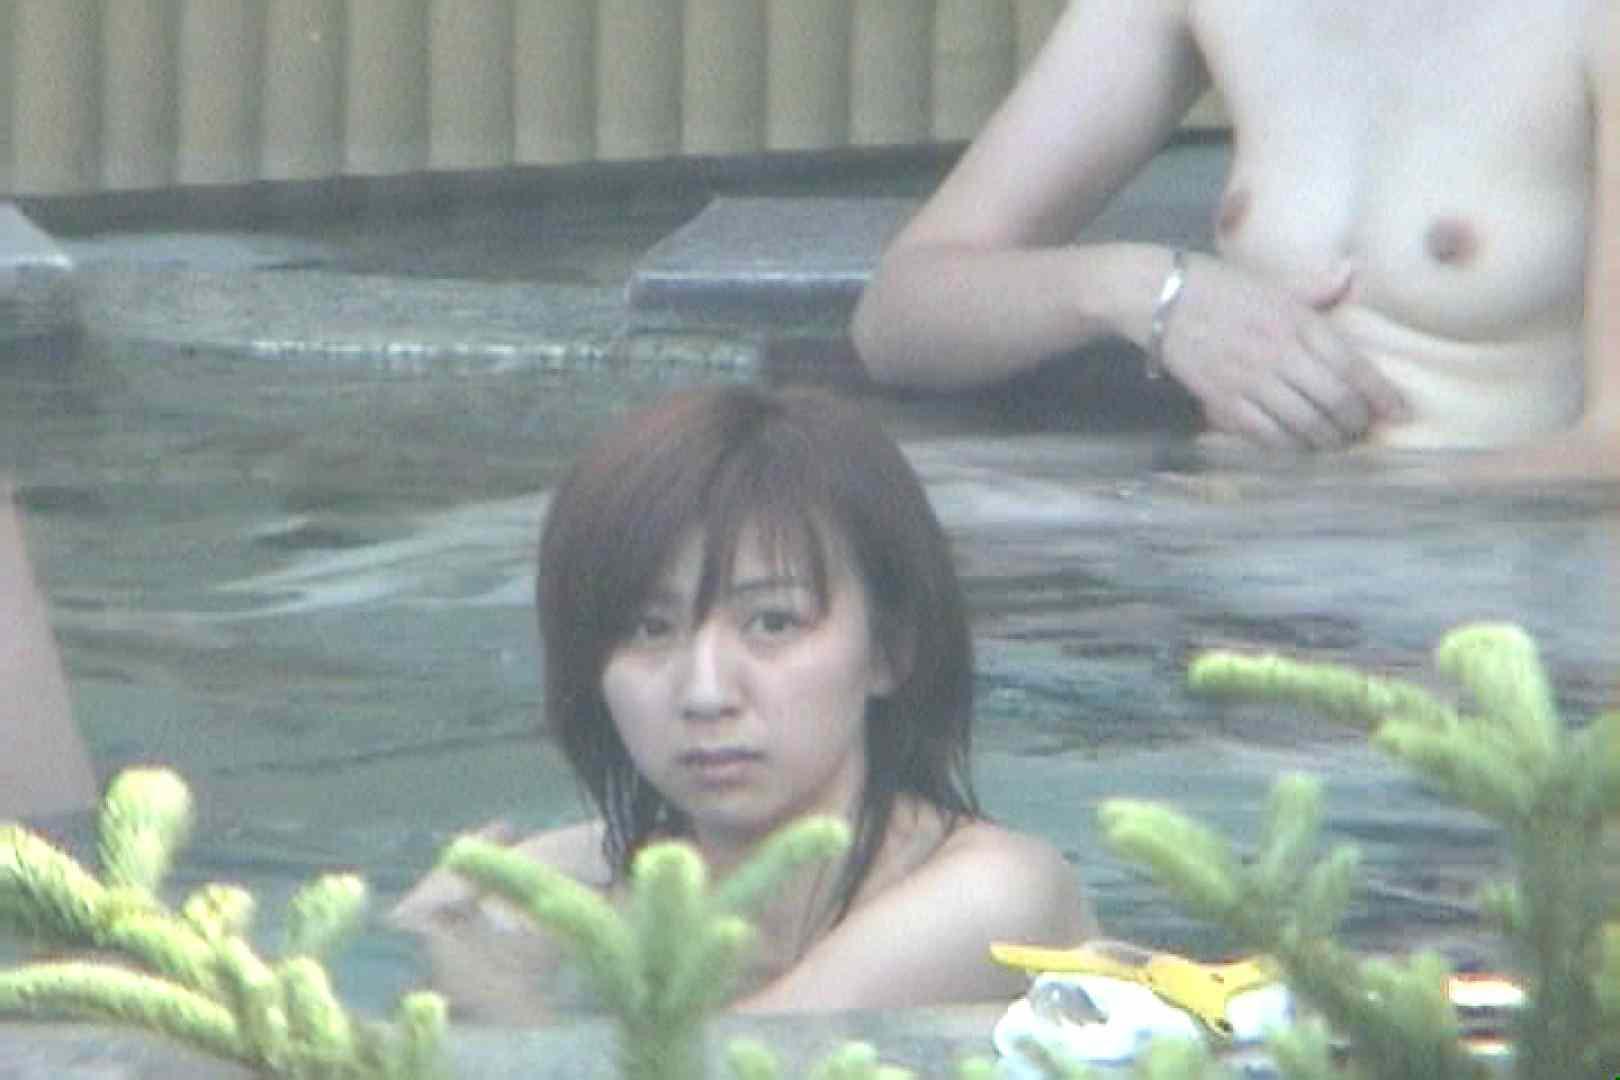 Aquaな露天風呂Vol.77【VIP限定】 盗撮師作品 おまんこ無修正動画無料 96pic 83